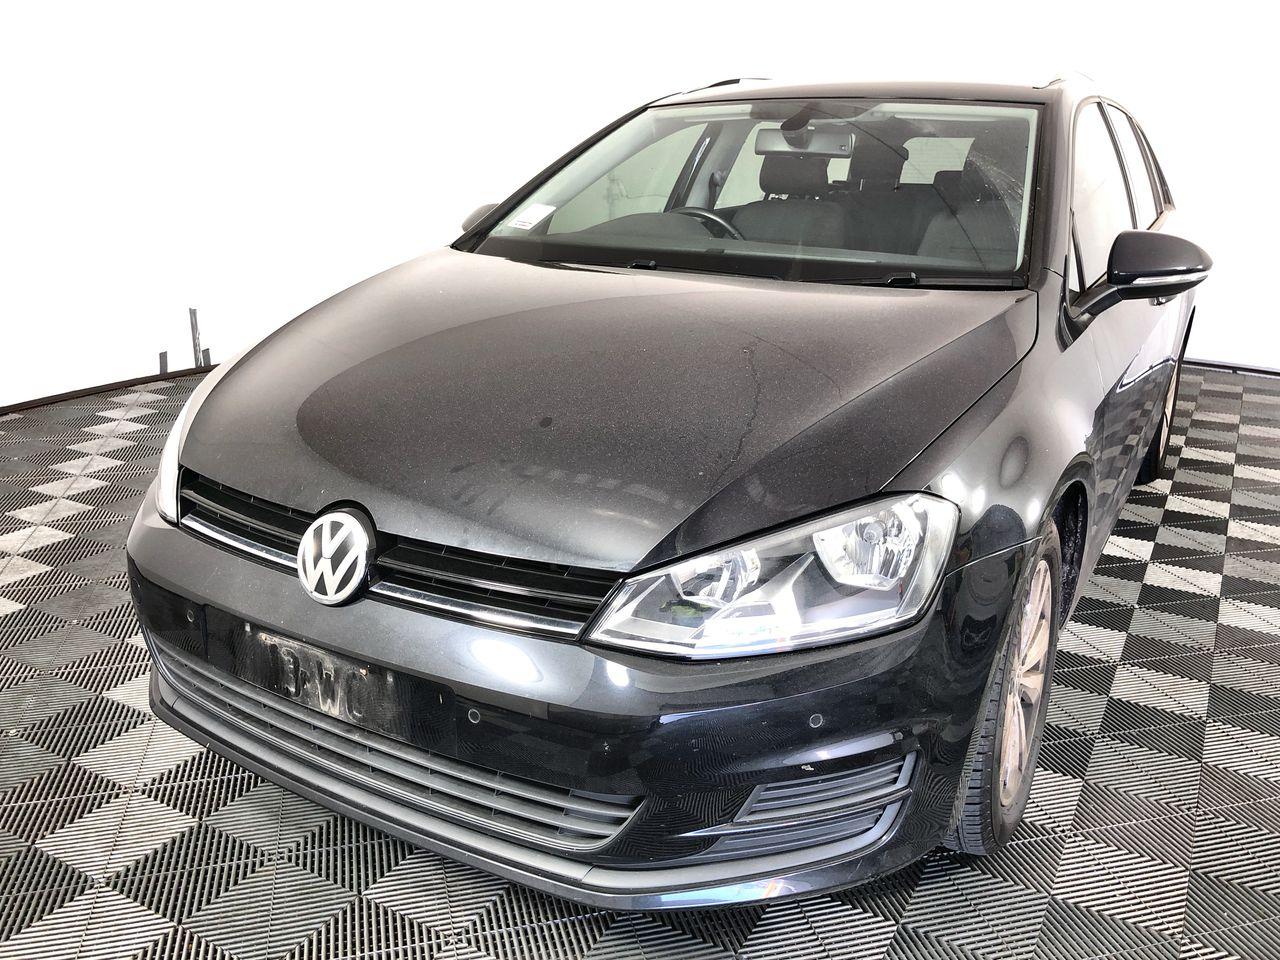 2015 Volkswagen Golf 90TSI Comfortline Automatic Wagon 64,803km